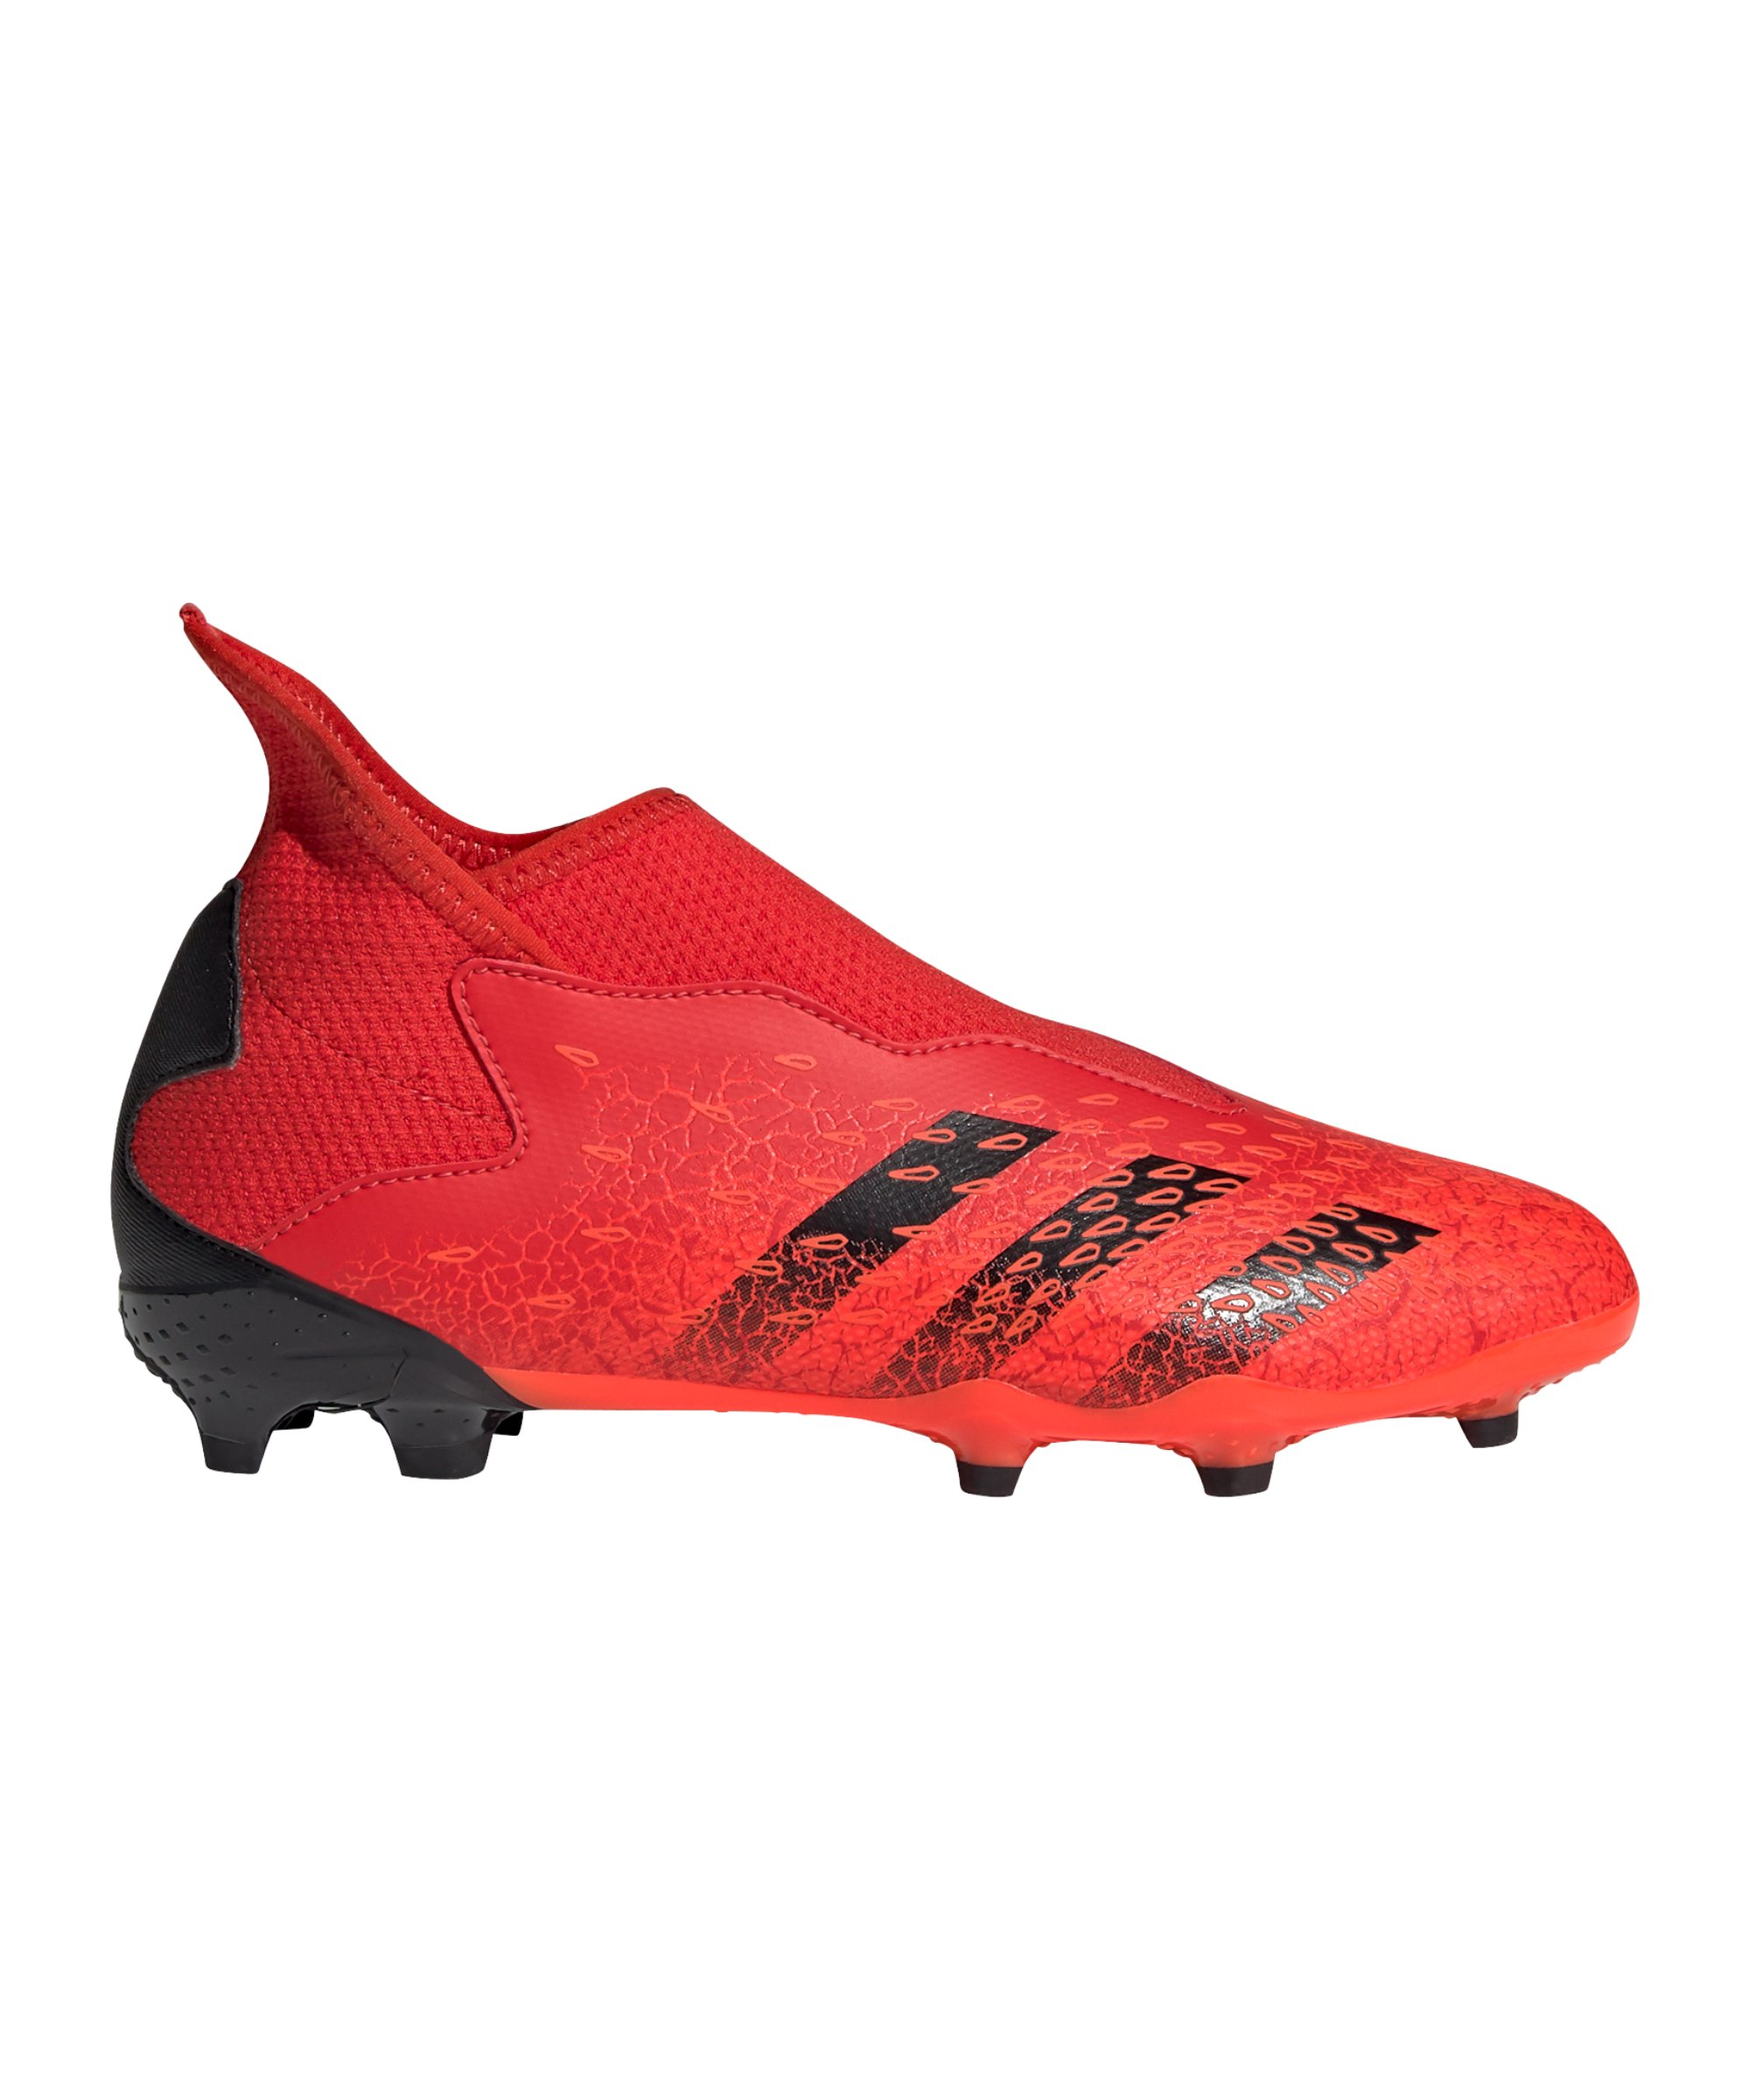 adidas Predator FREAK.3 LL FG Meteorite J Kids Rot Schwarz - rot